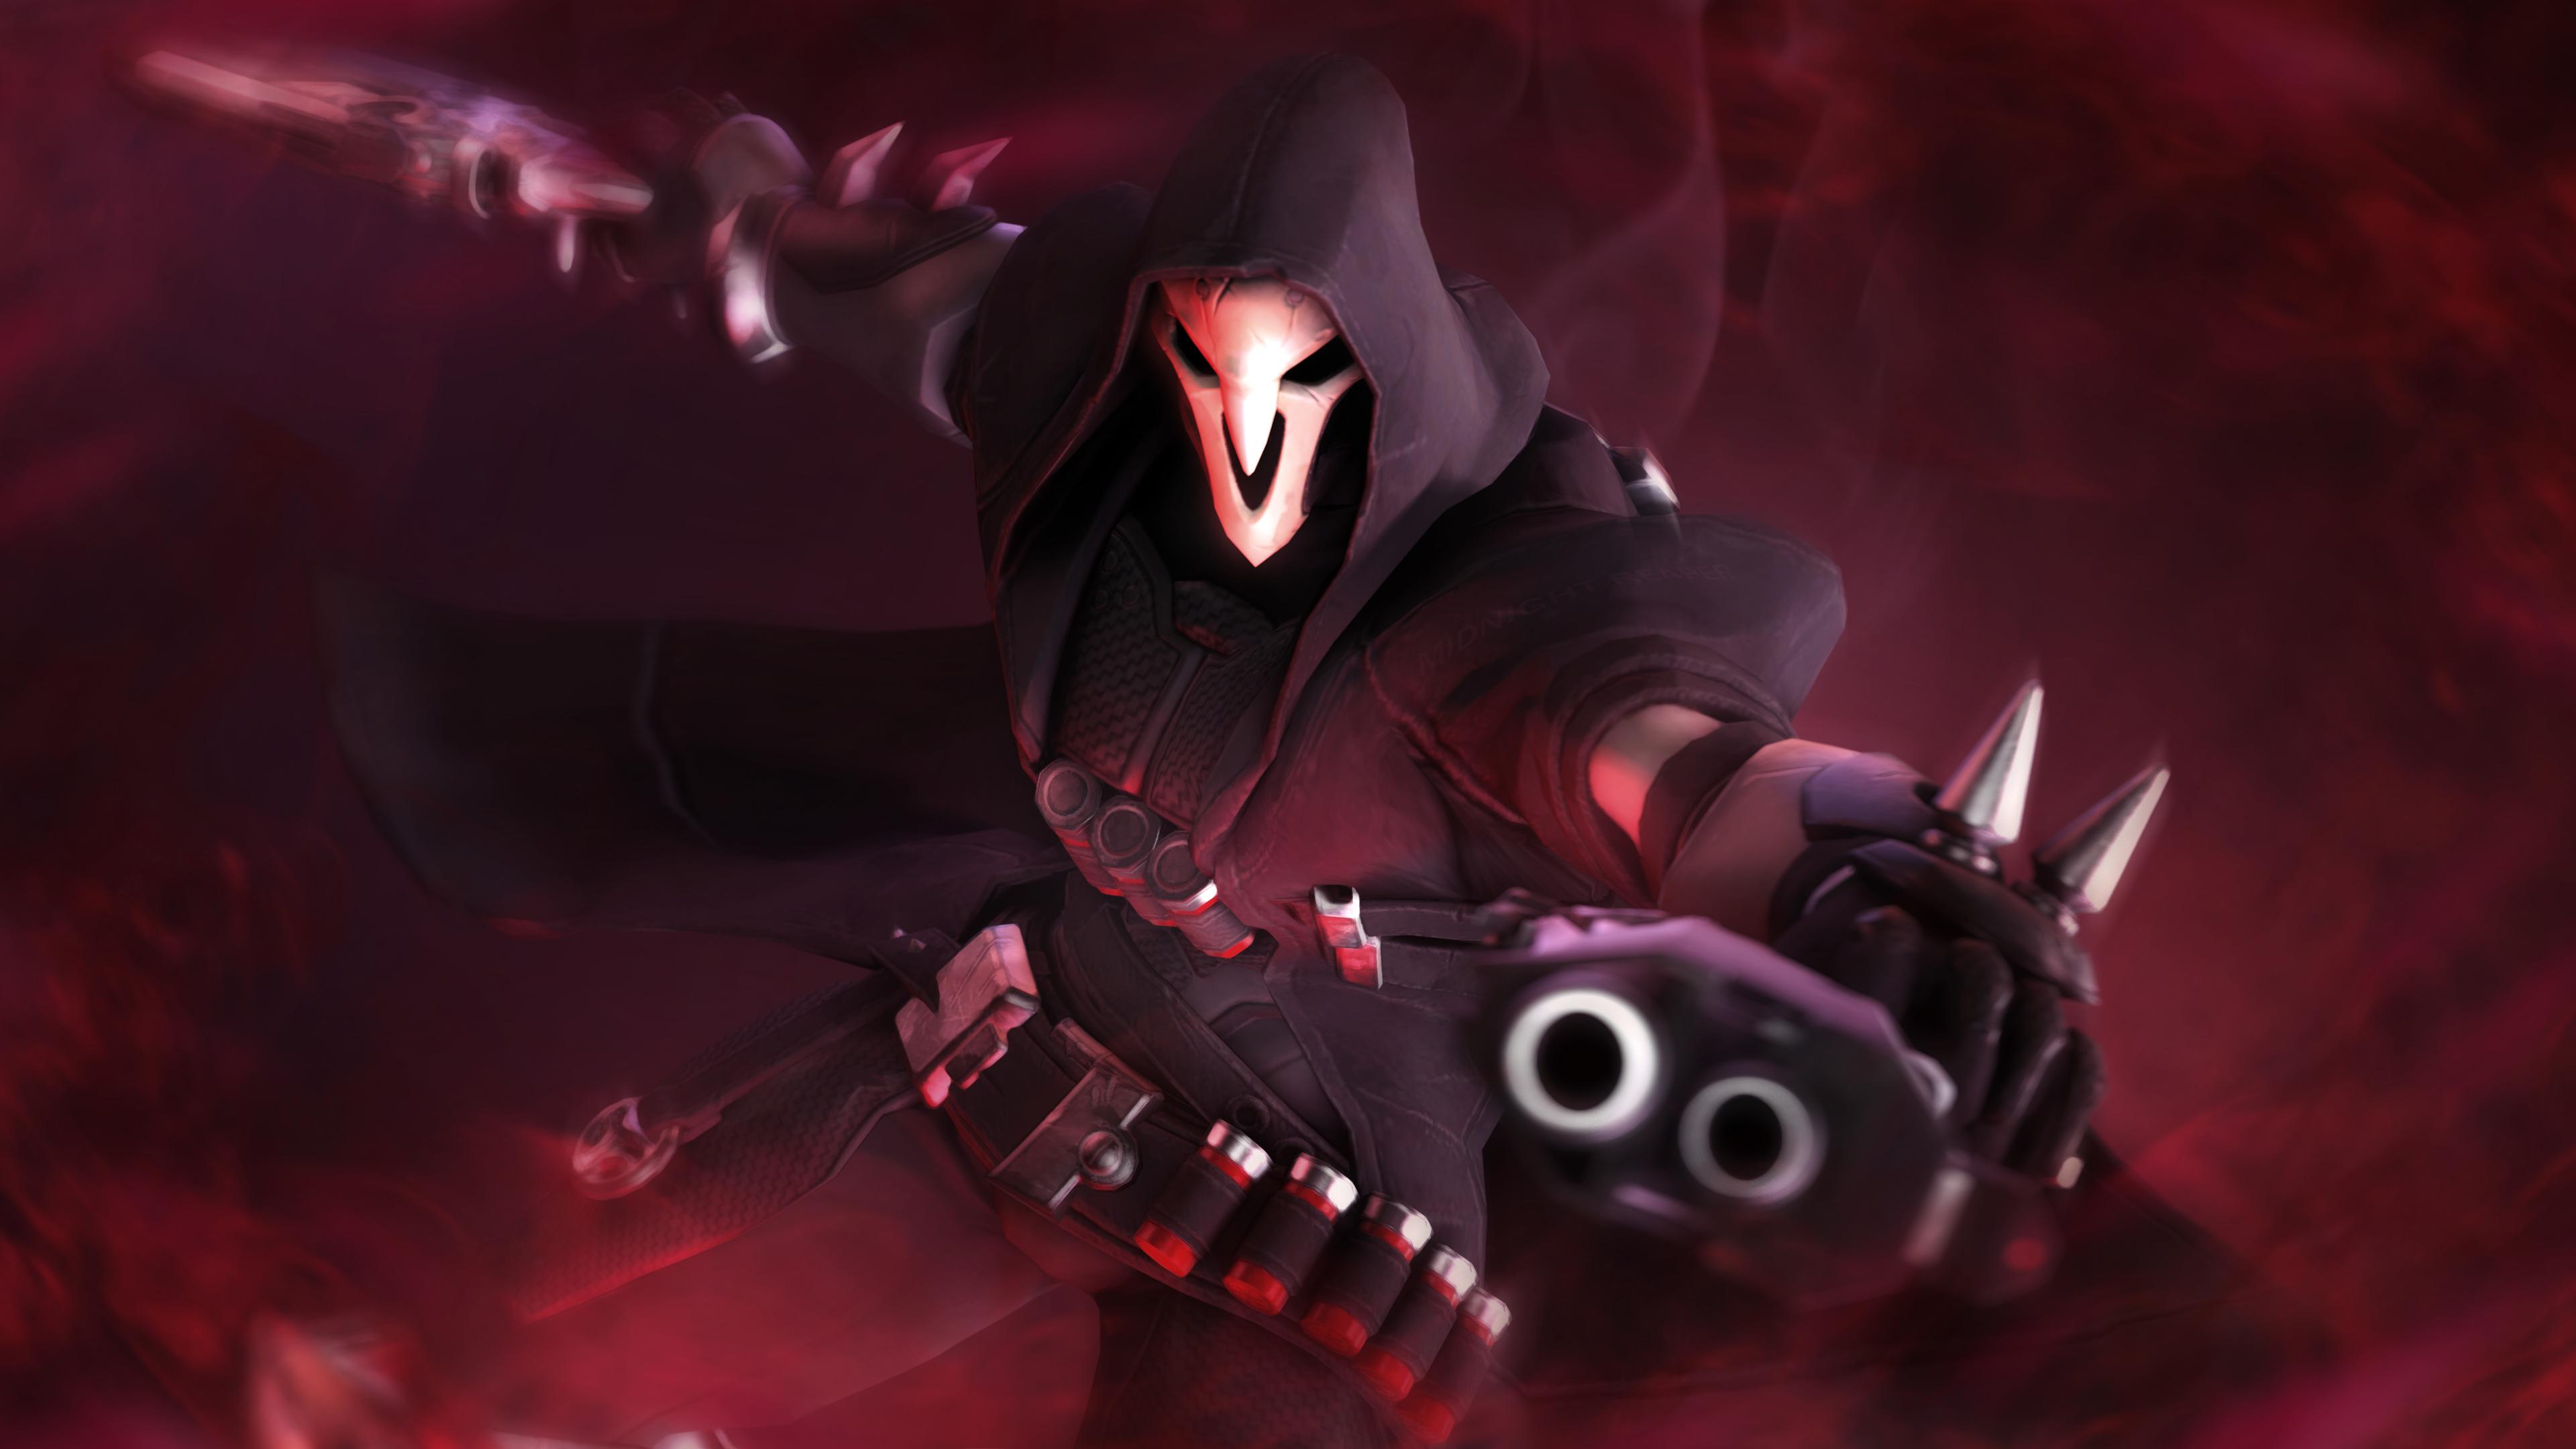 2048x2048 Sombra Overwatch Hd Ipad Air Hd 4k Wallpapers: Reaper Overwatch 5k Xbox Games Wallpapers, Reaper